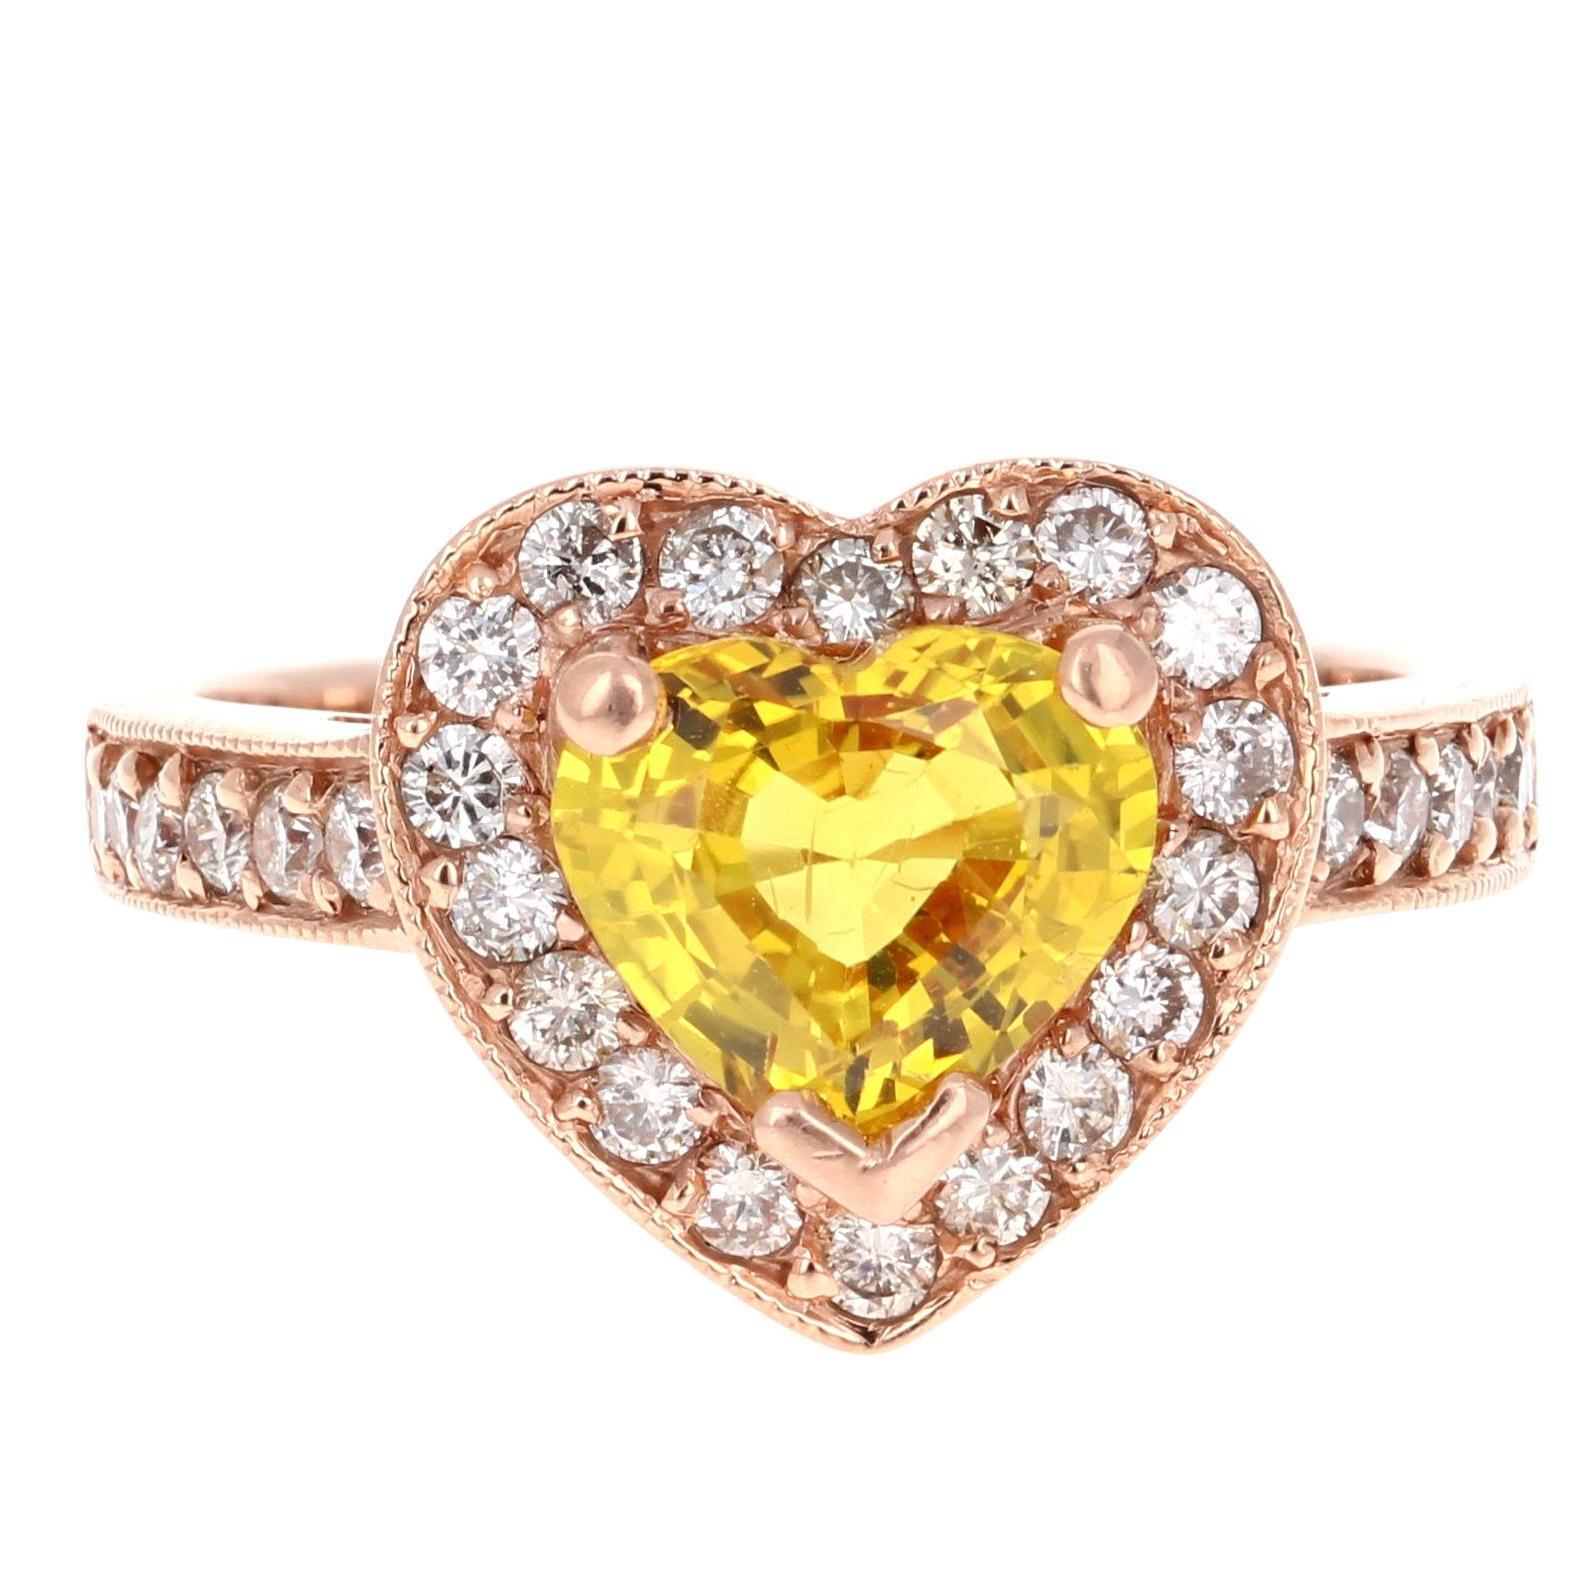 2.71 Carat Heart Cut Yellow Sapphire Diamond Engagement Ring